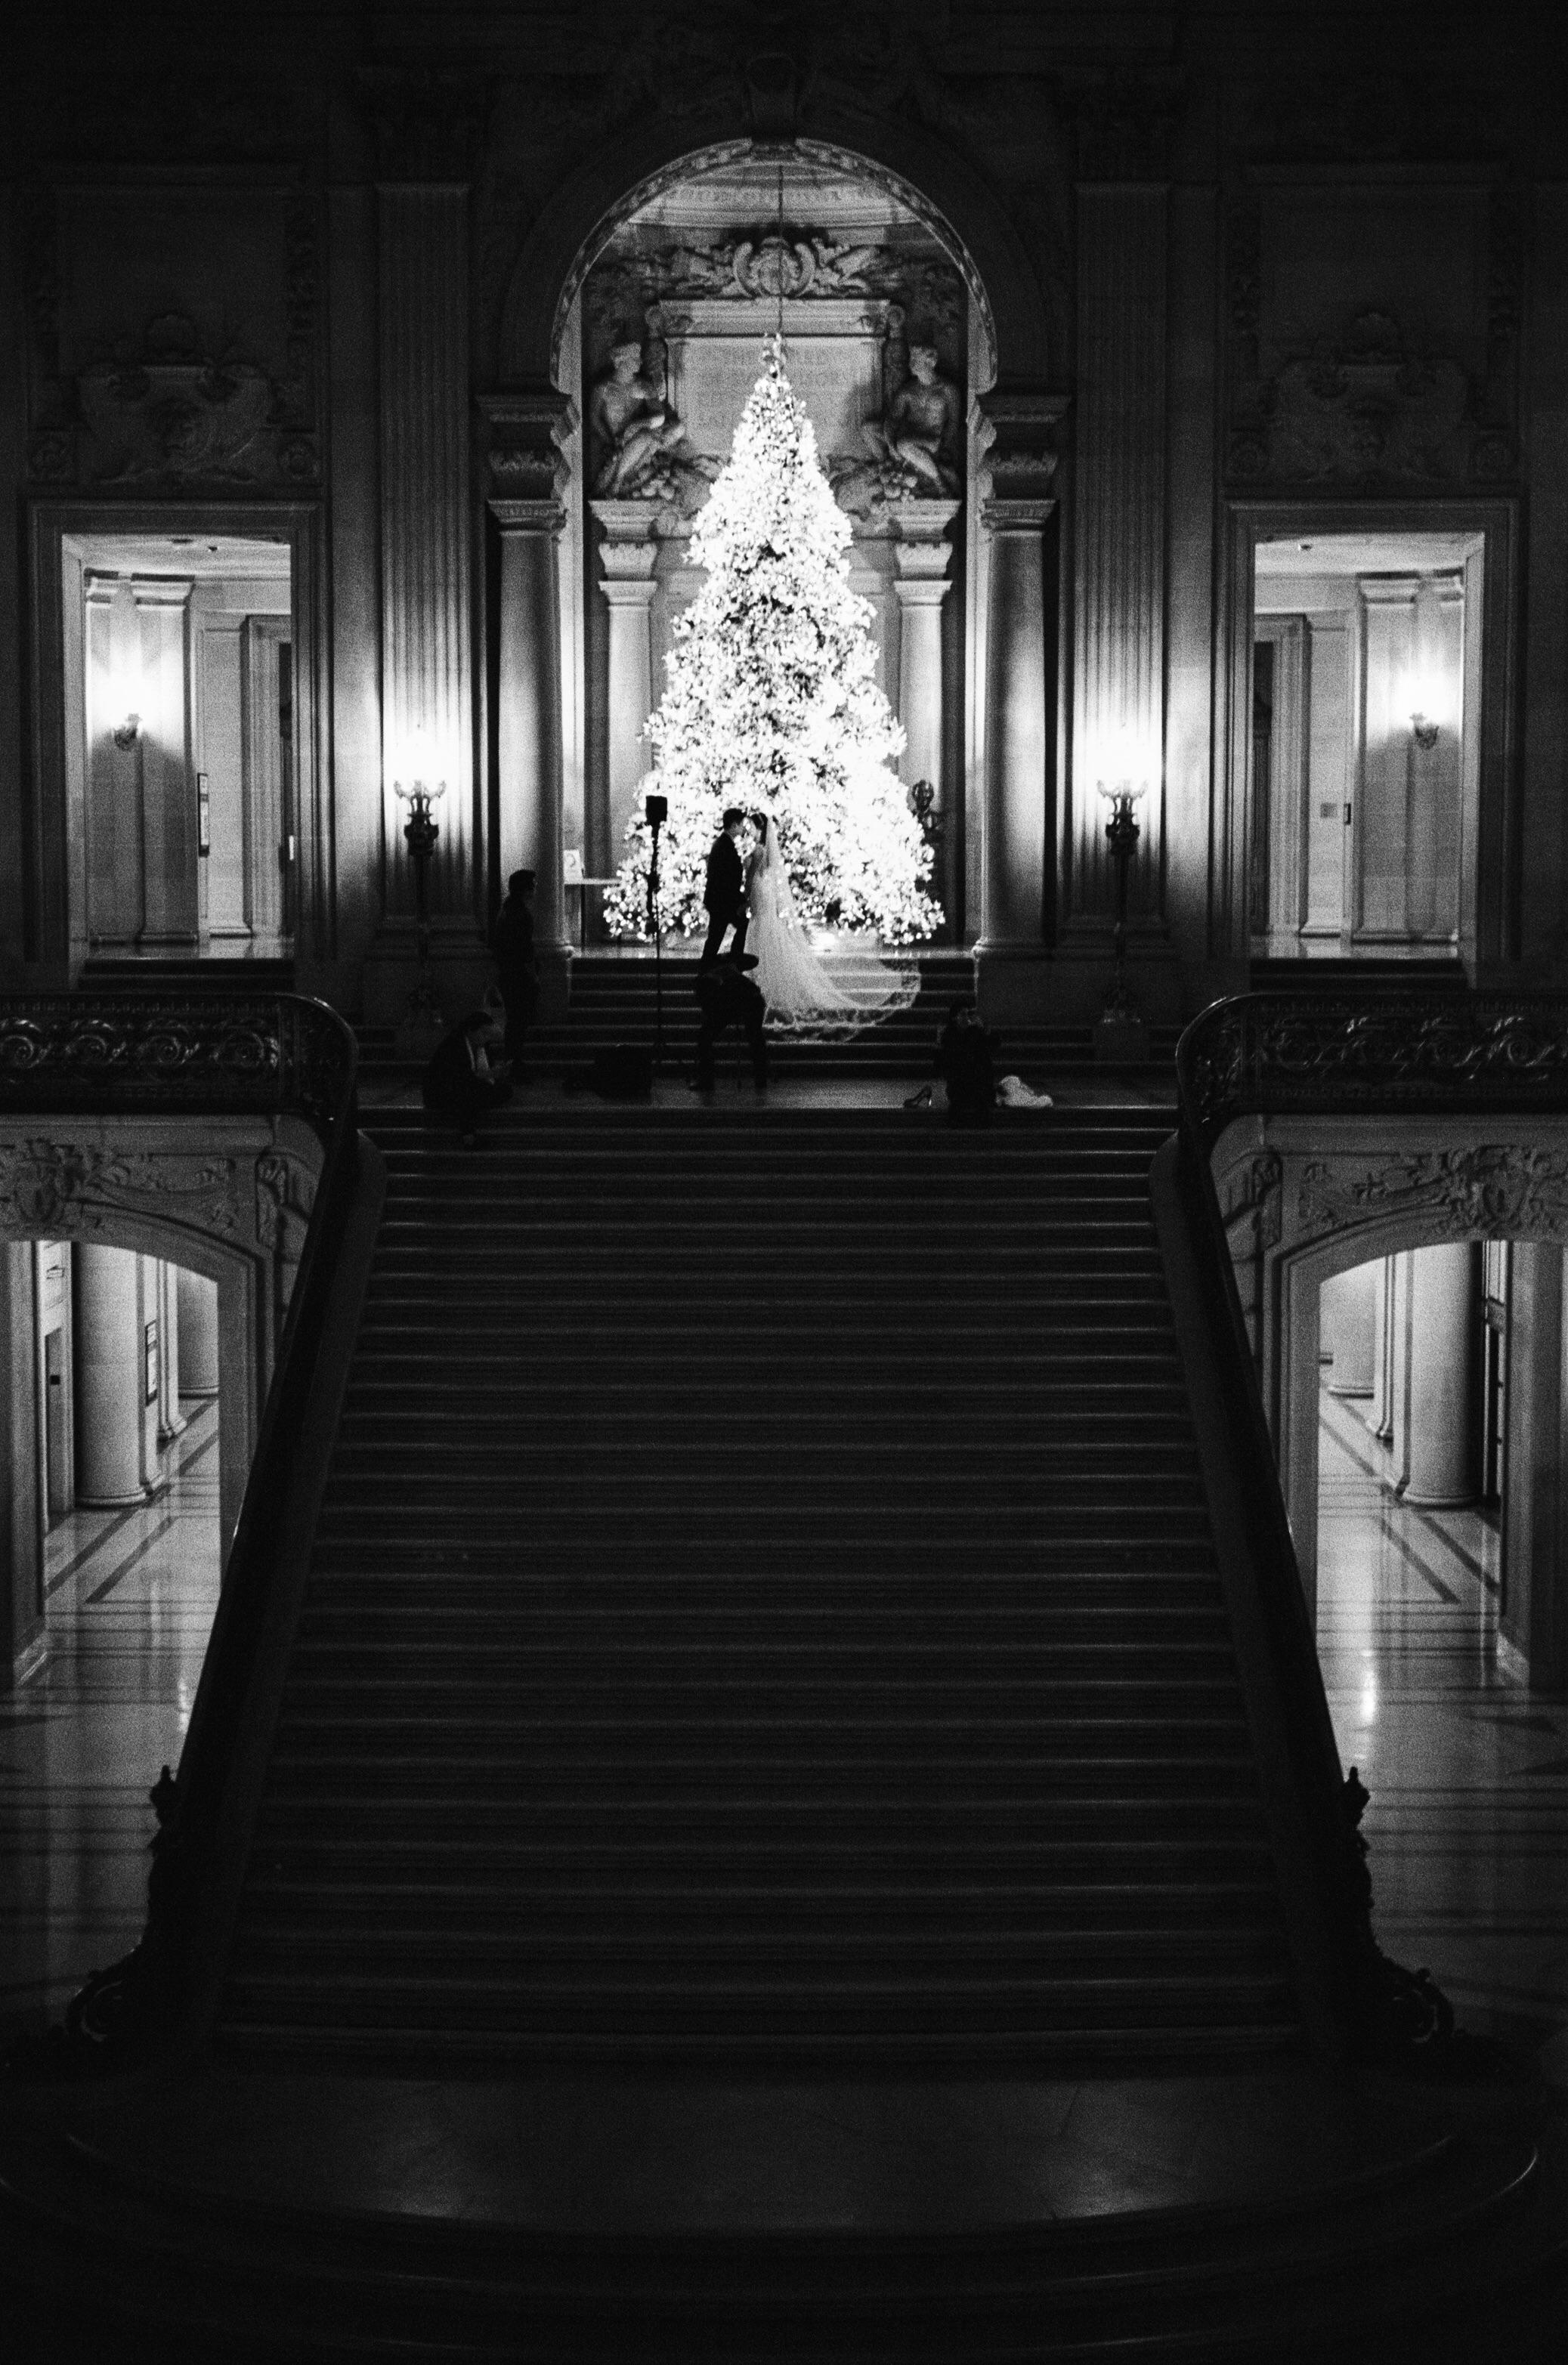 Caught a wedding shoot at SF city hall